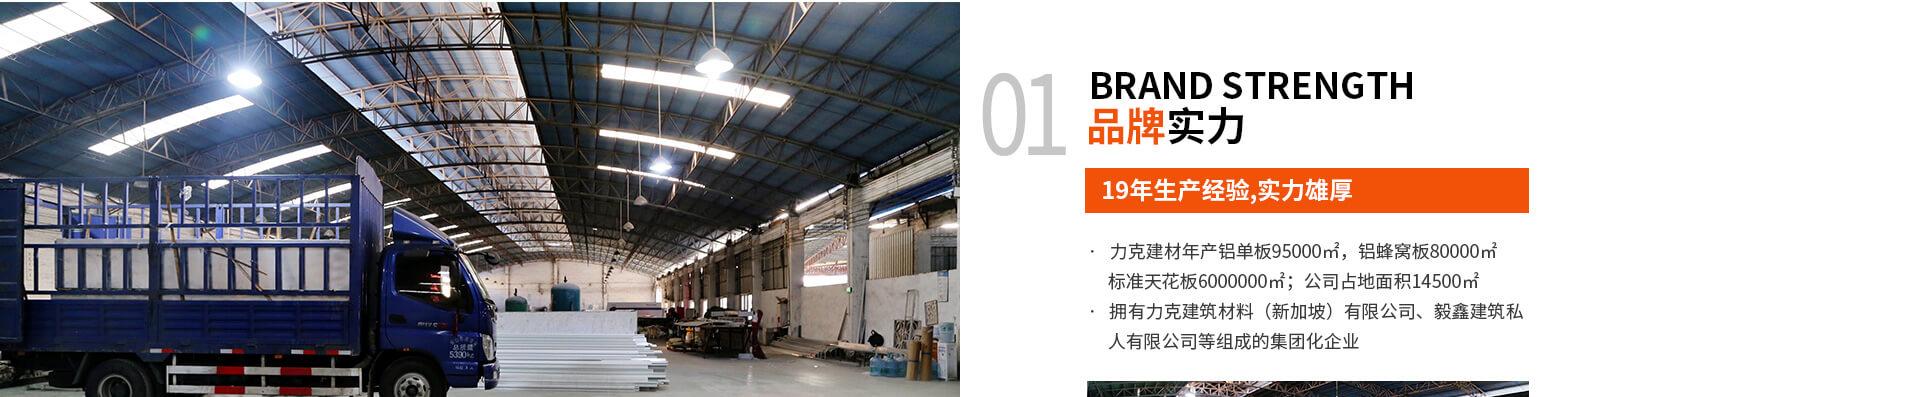 01 BRAND STRENGTH 品牌实力 19年生产经验,实力雄厚 ·   力克建材年产铝单板95000㎡,铝蜂窝板80000㎡                标准天花板6000000㎡;公司占地面积14500㎡           ·   拥有力克建筑材料(新加坡)有限公司、毅鑫建筑私                人有限公司等组成的集团化企业